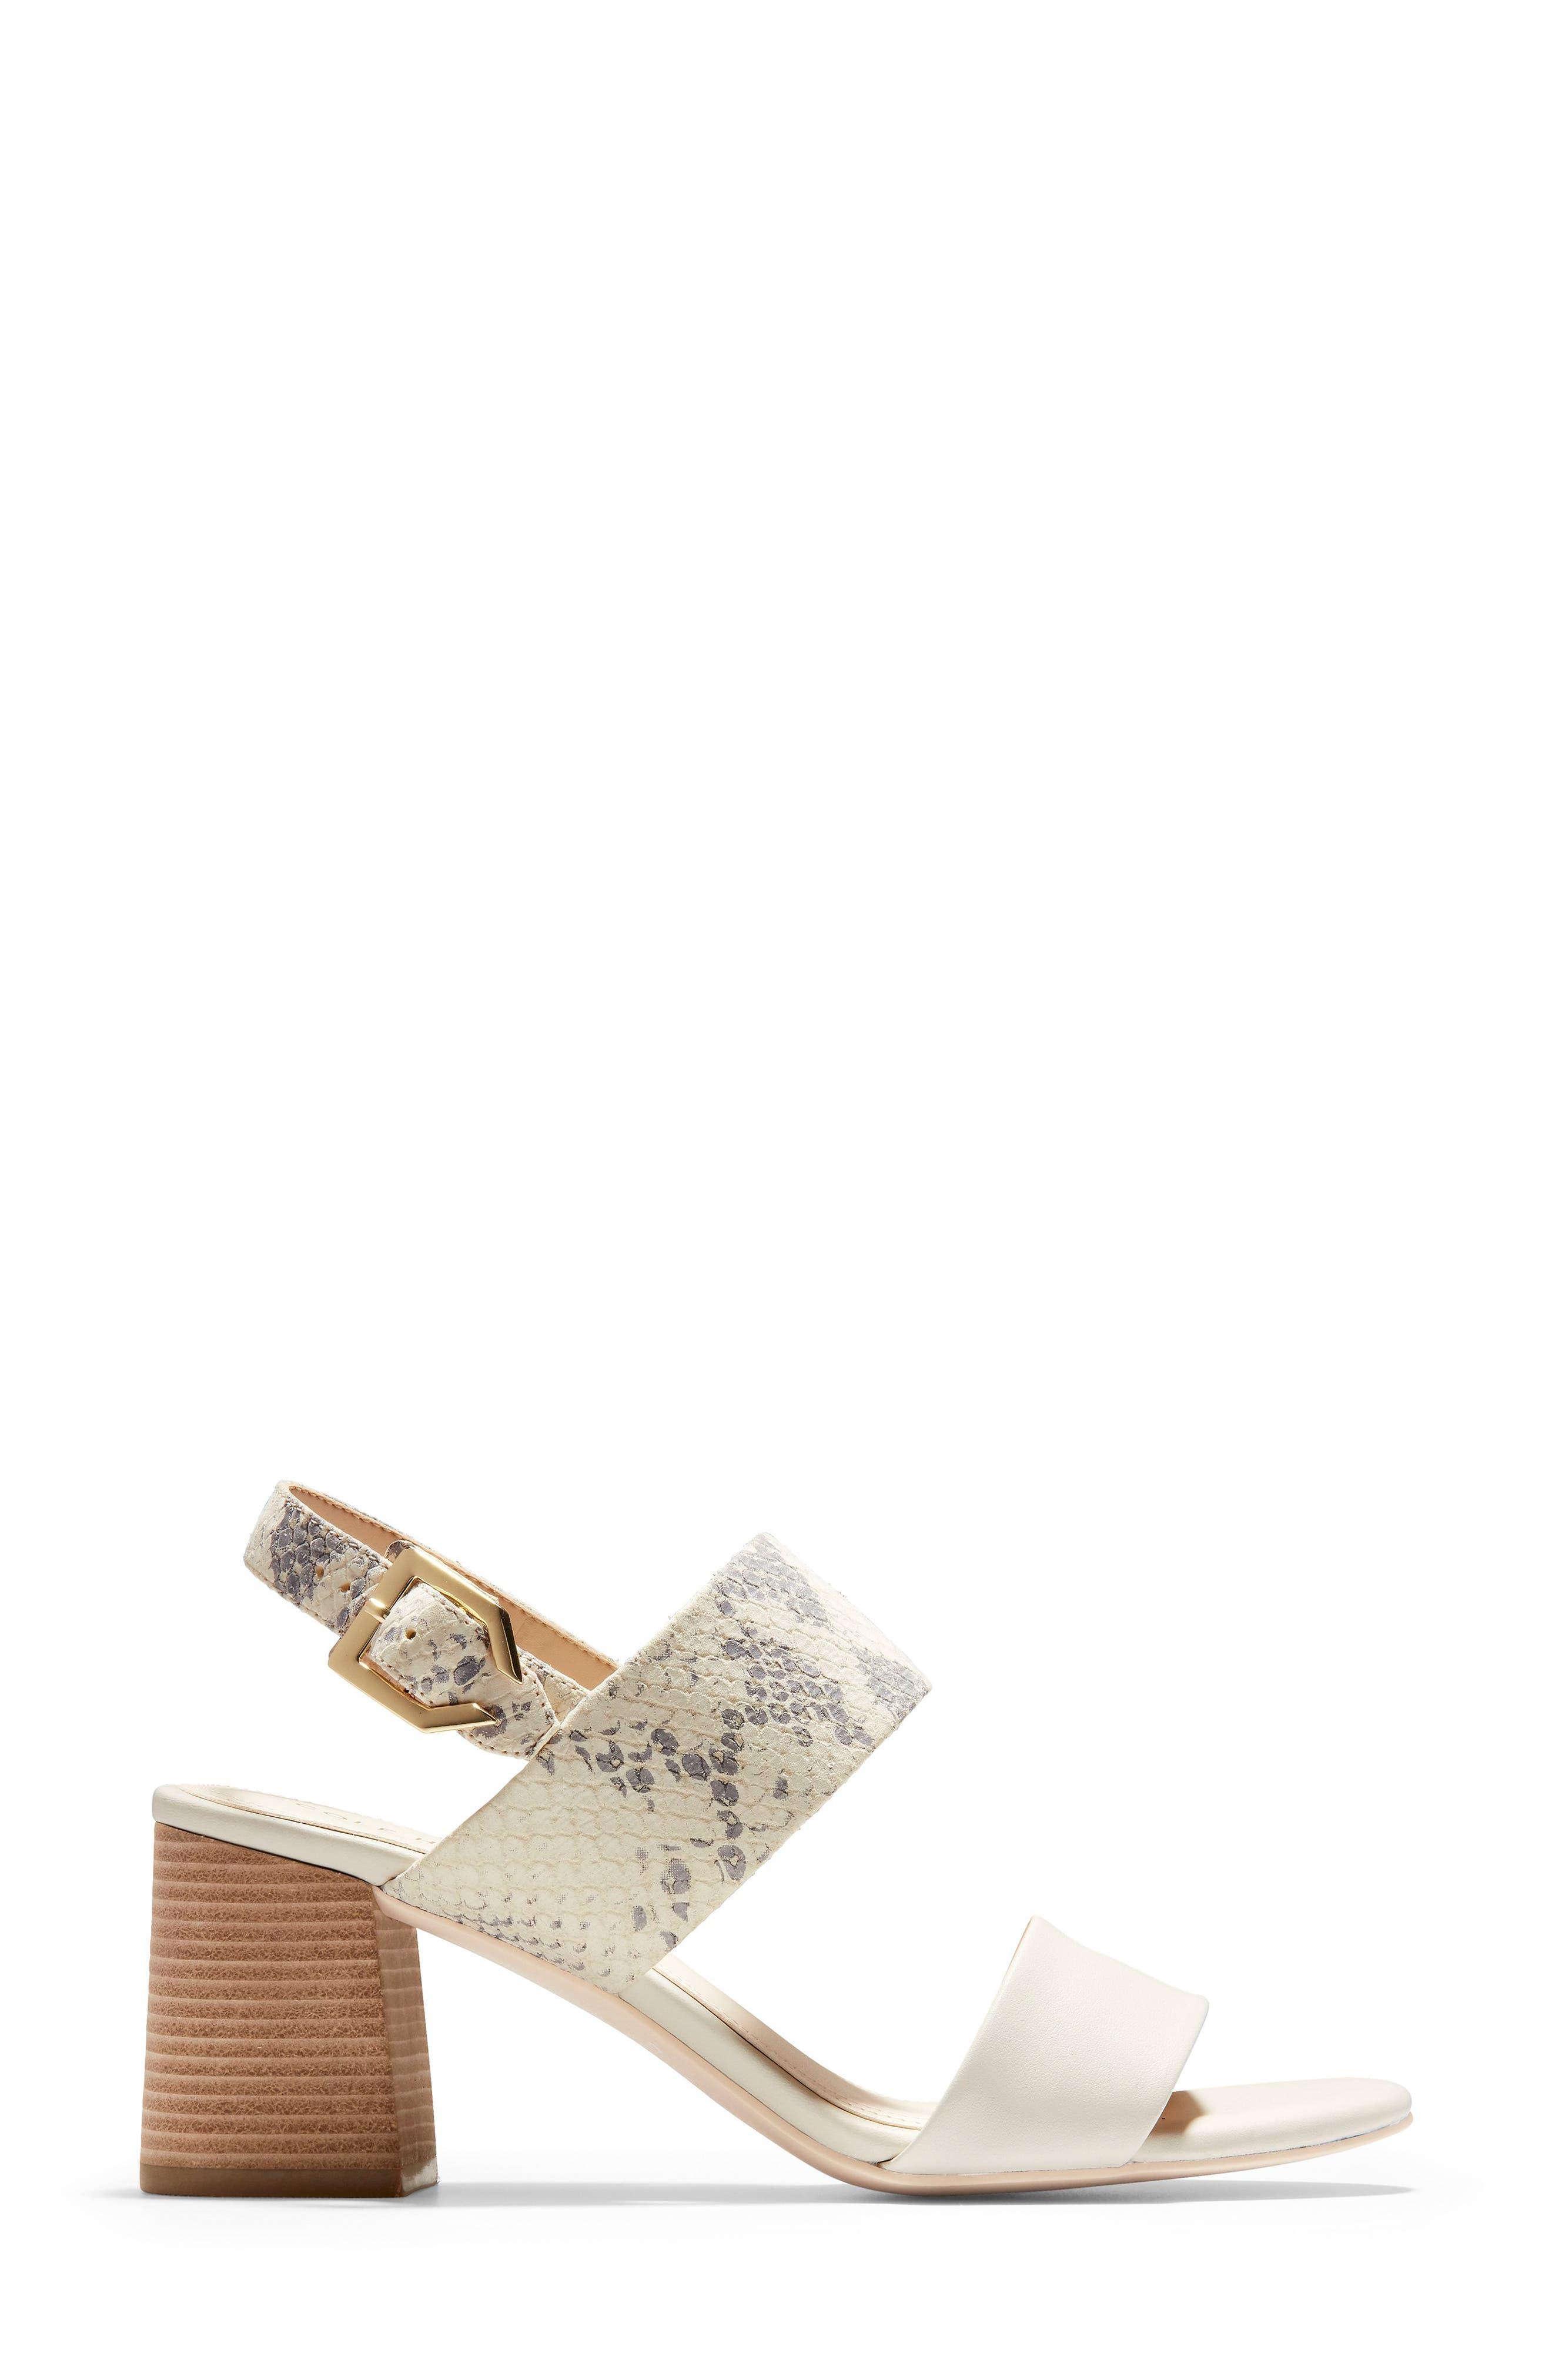 COLE HAAN, Avani Block Heel Sandal, Alternate thumbnail 3, color, IVORY PRINT LEATHER